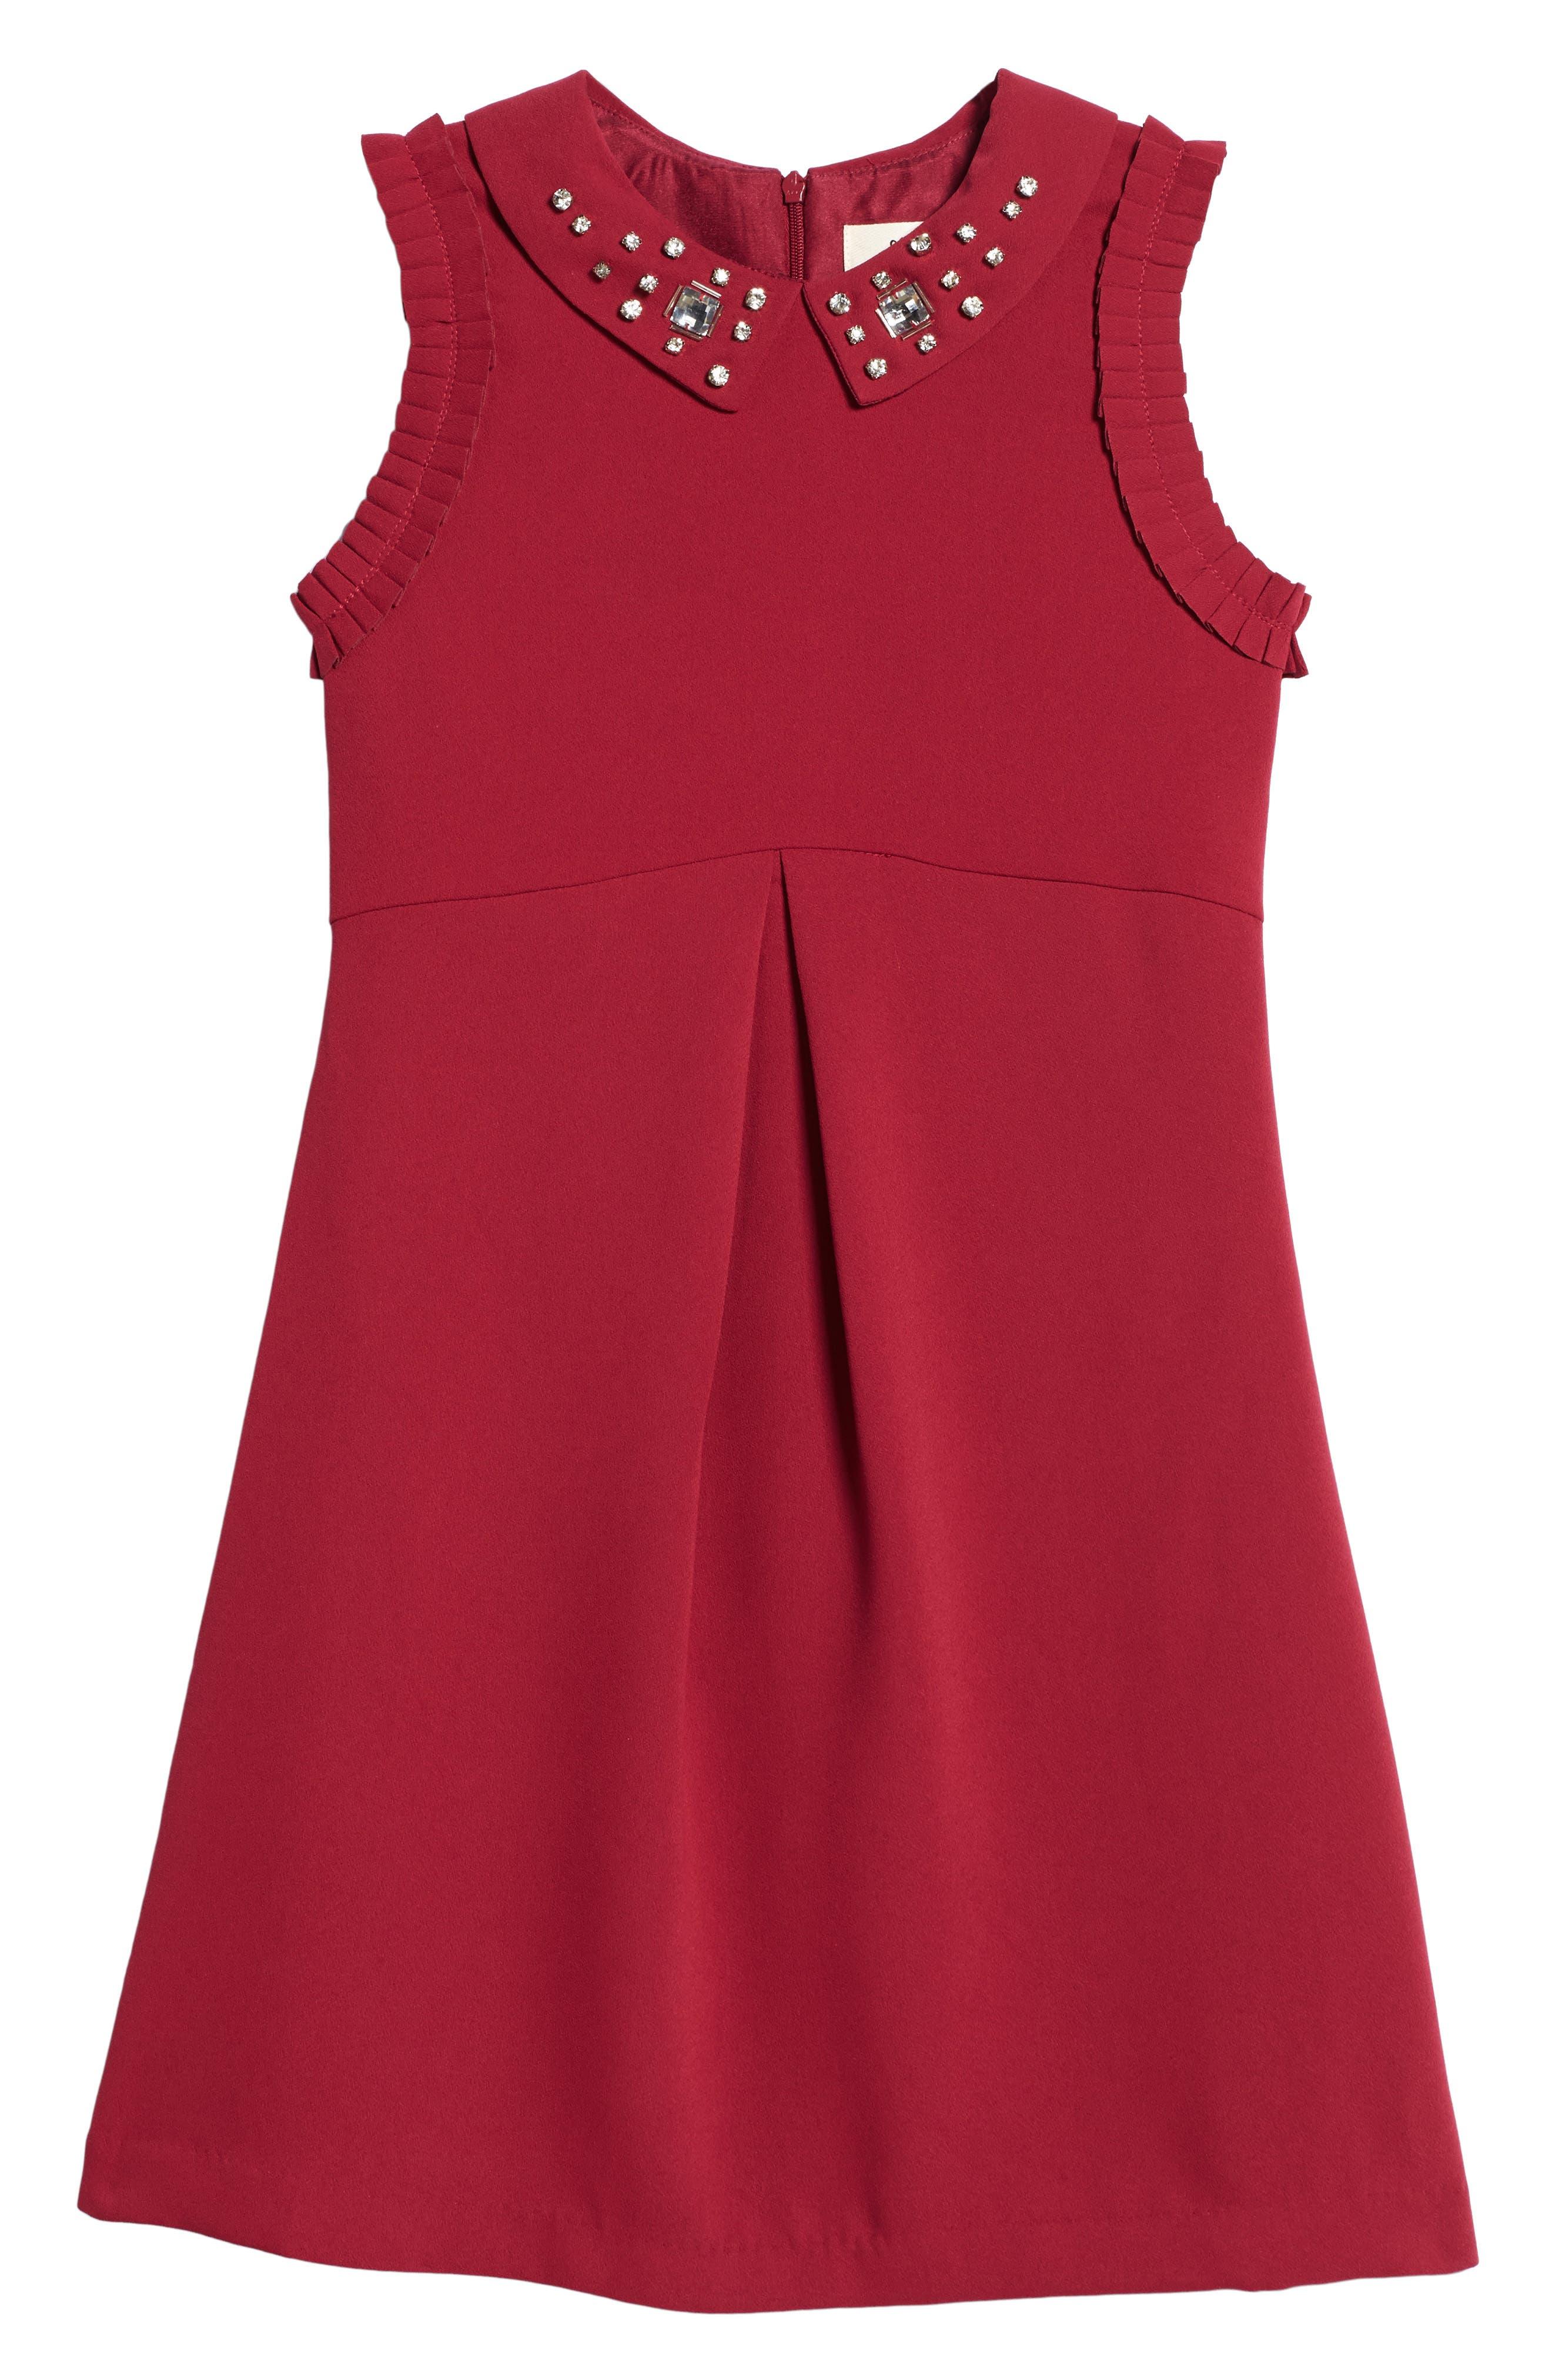 Point Collar Dress,                             Main thumbnail 1, color,                             Burgundy